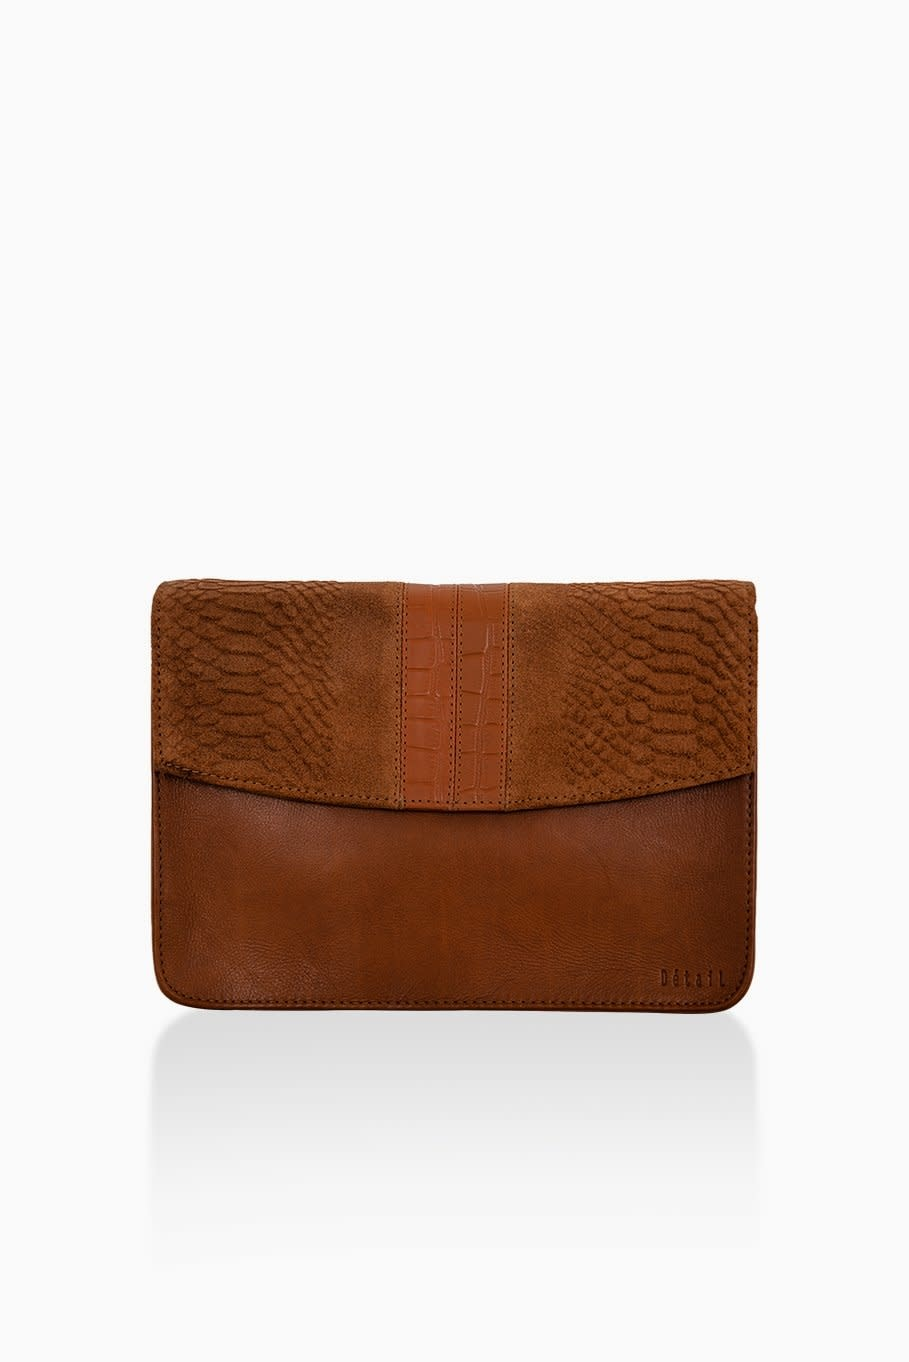 Détail Detail Harmony handbag Amber anaconda 27.5 x 9 x 20 cm